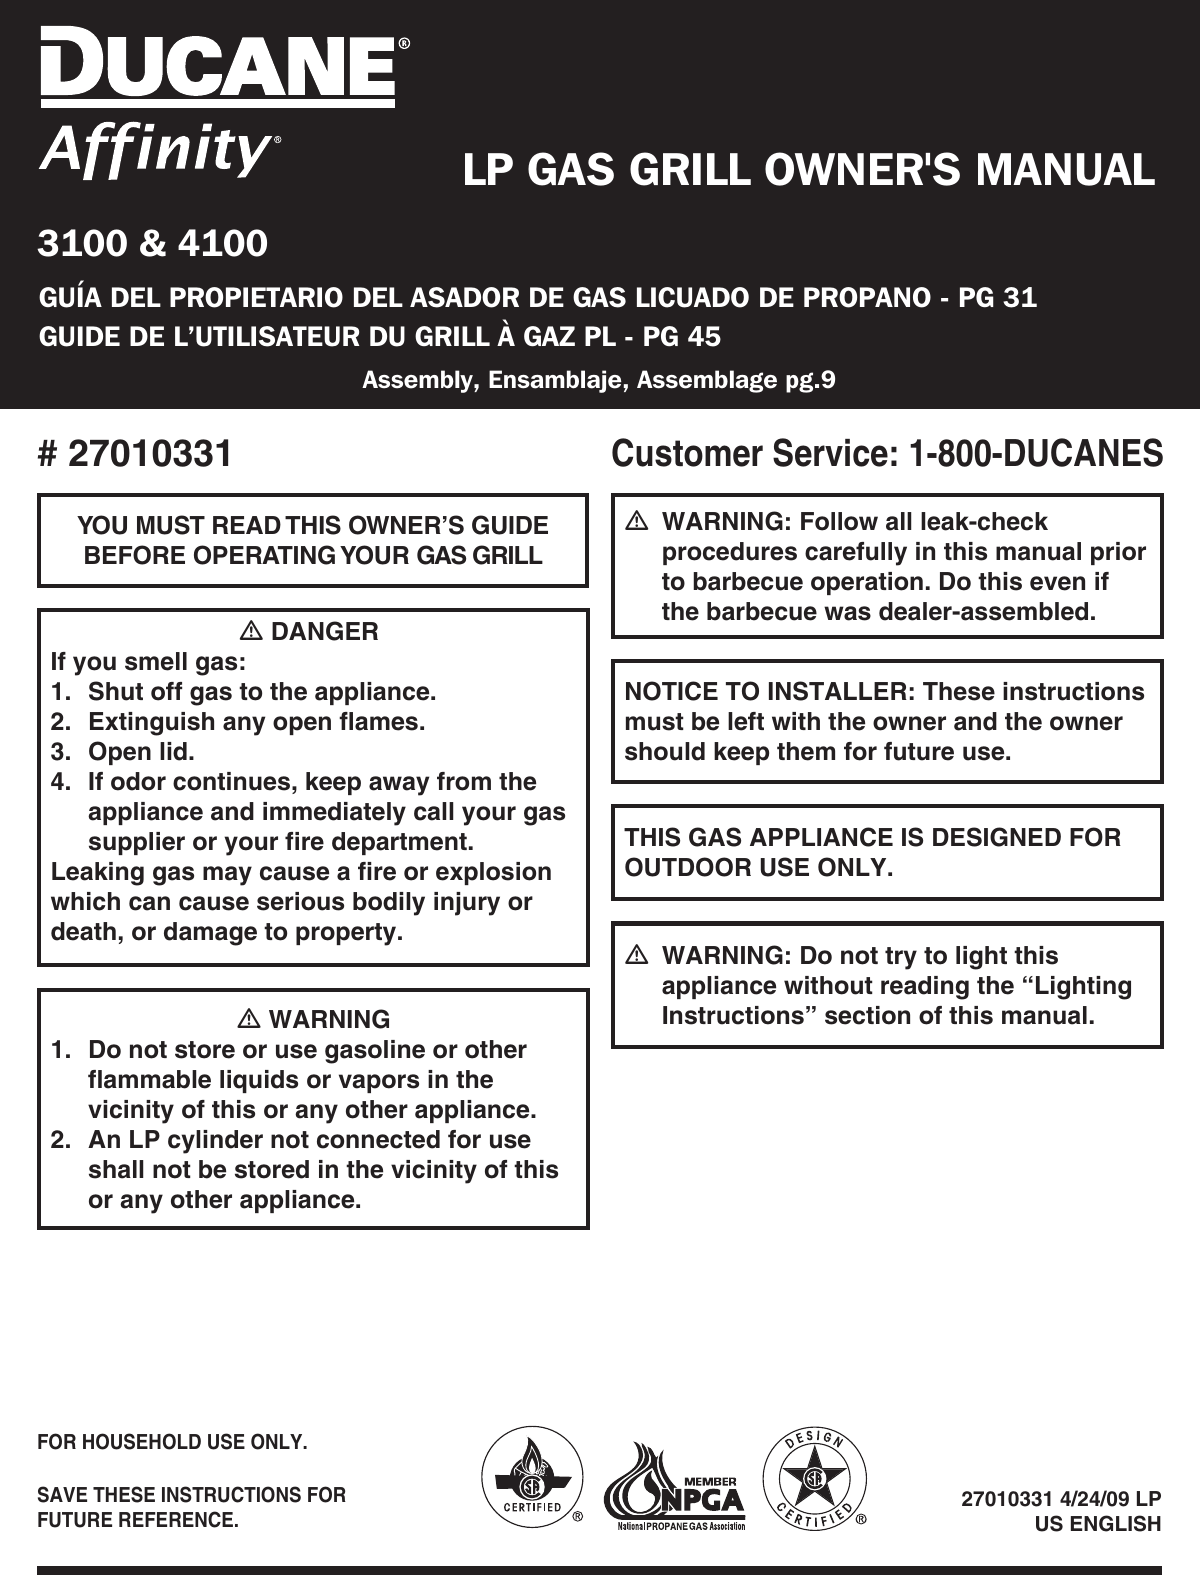 ducane duacne affinity lp gass grill 3100 users manual rh usermanual wiki